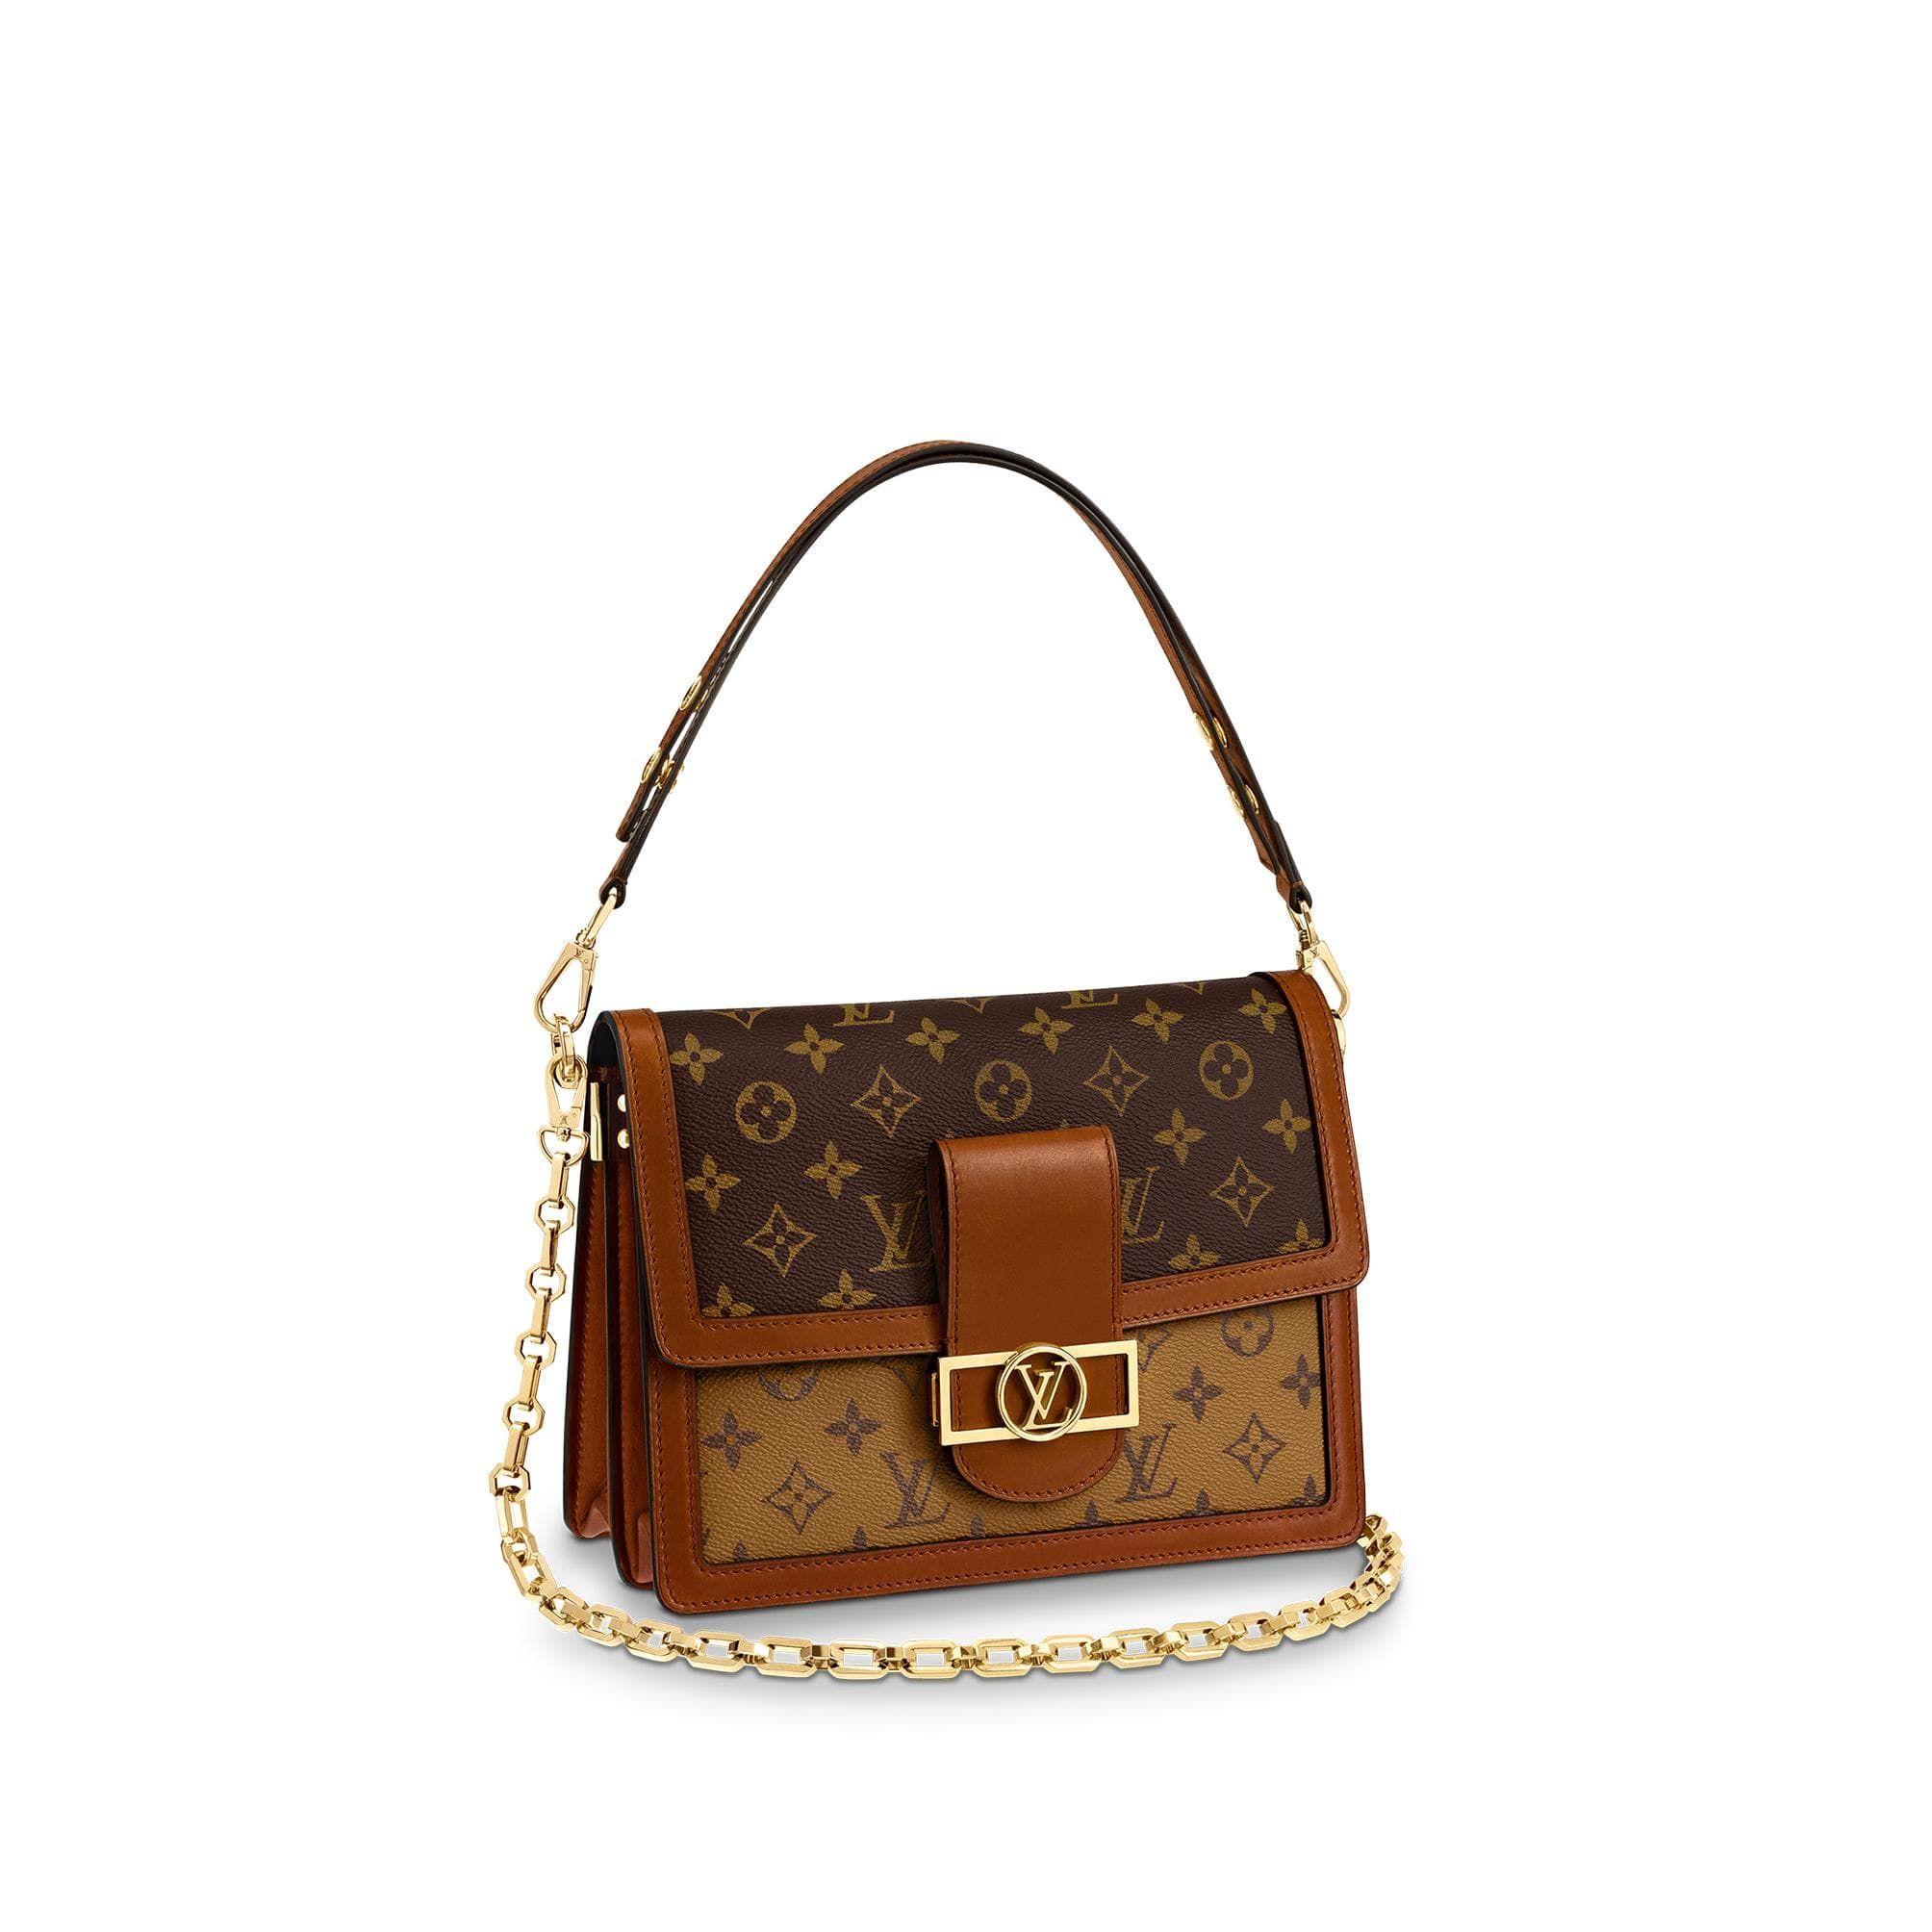 ea87bd02d Dauphine MM in 2019 | Handbags | Louis vuitton handbags, Louis ...